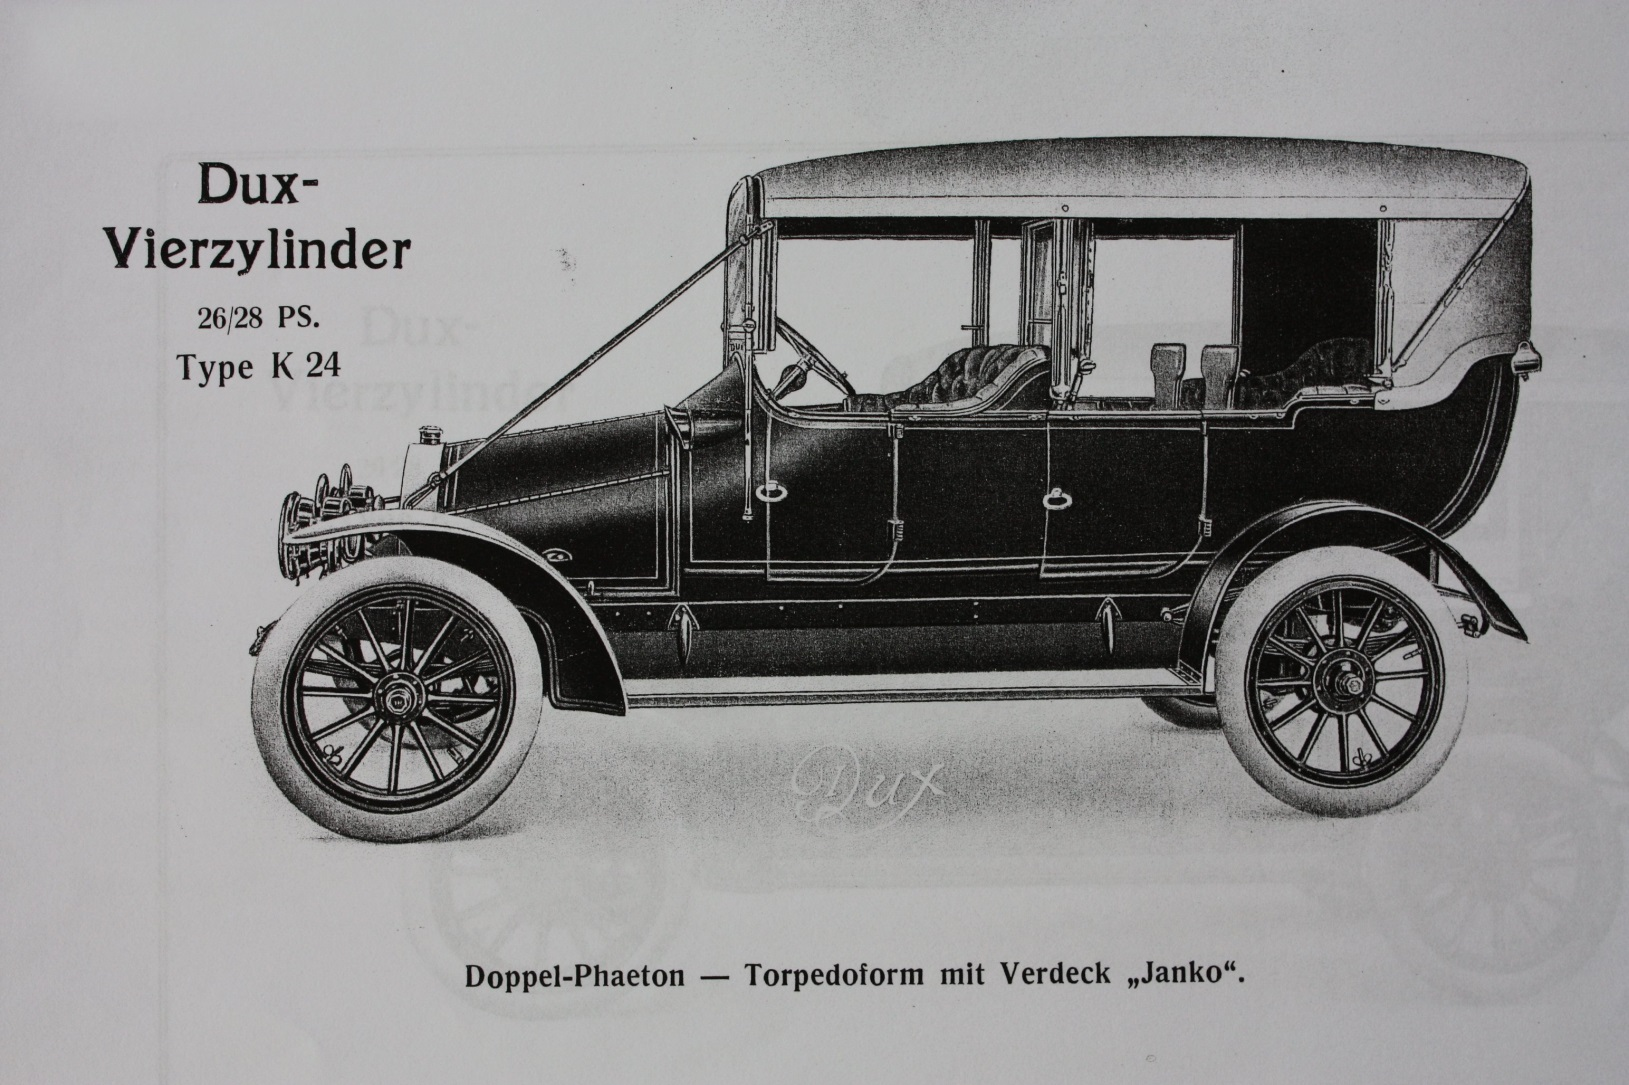 buses trucks cars and more dux leipzig germany myn. Black Bedroom Furniture Sets. Home Design Ideas